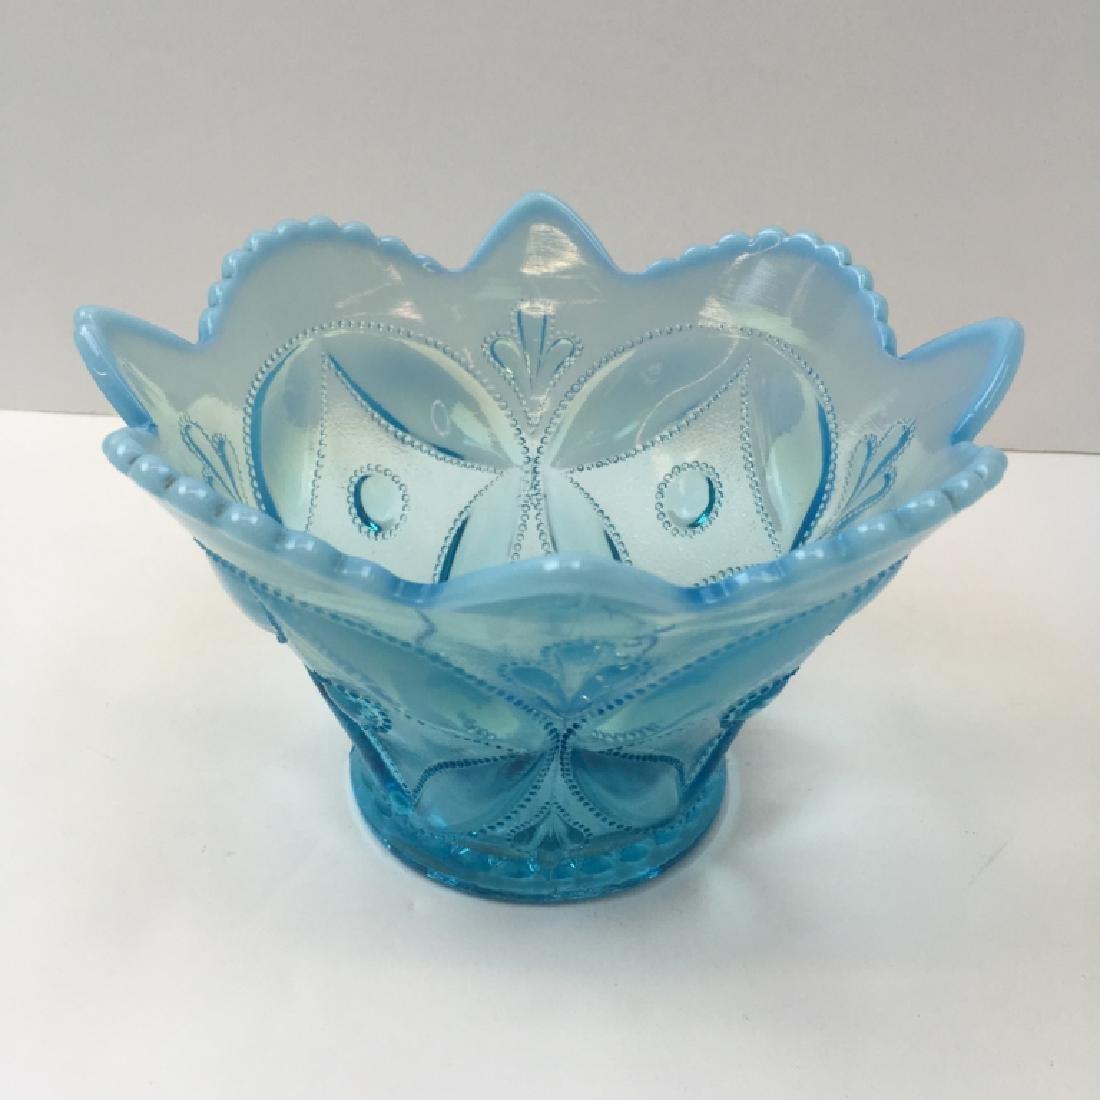 5 PCS OF VINTAGE BLUE OPALESCENT & SATIN GLASS - 7